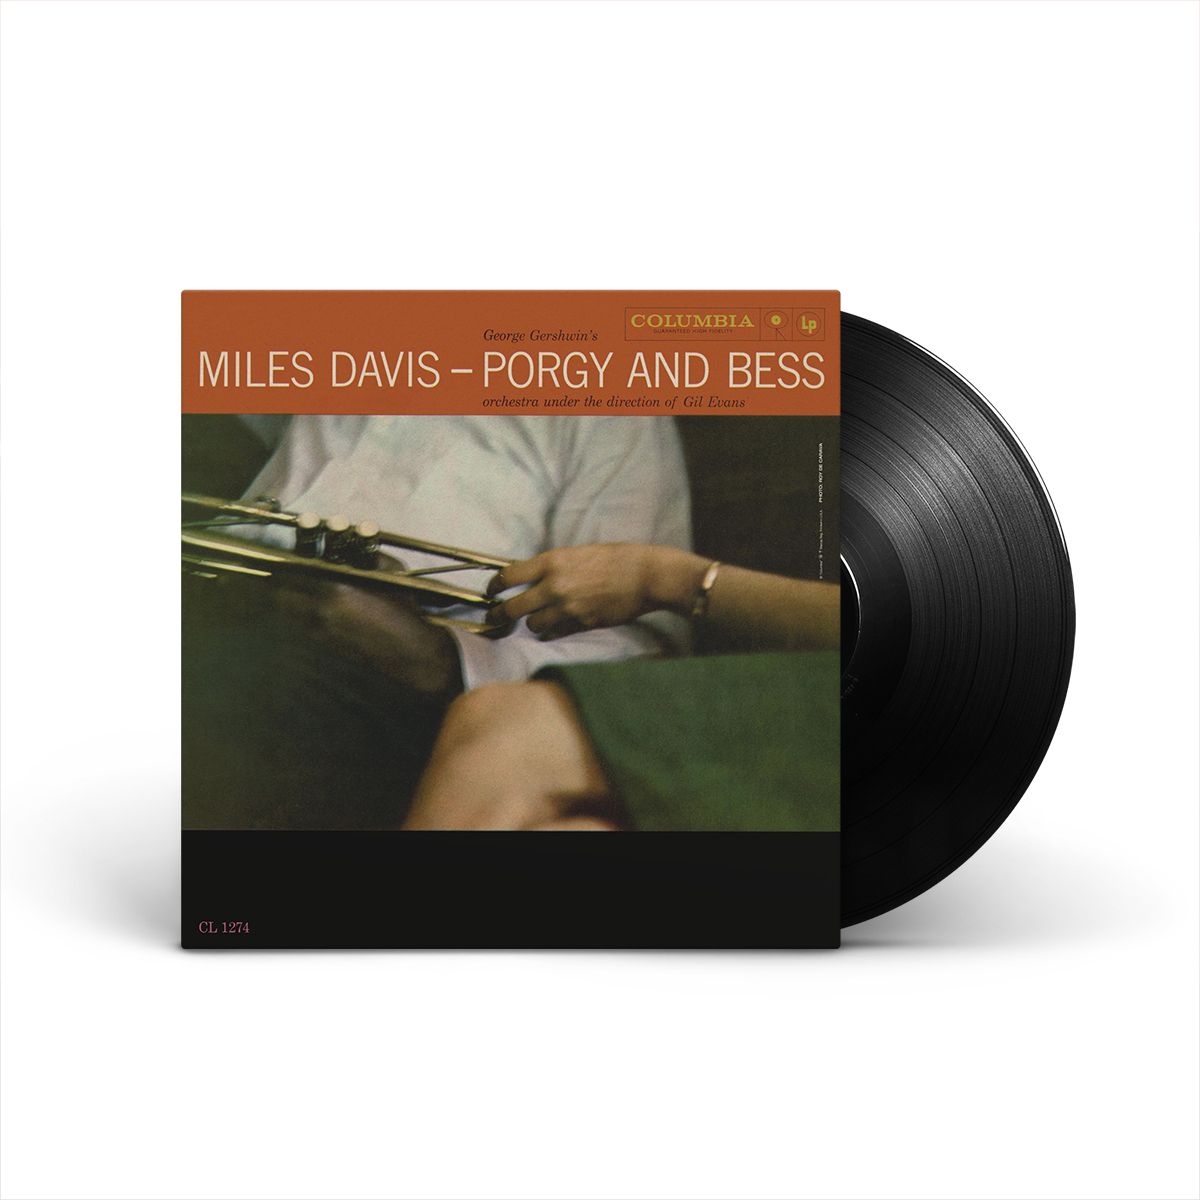 Miles Davis Porgy And Bess LP